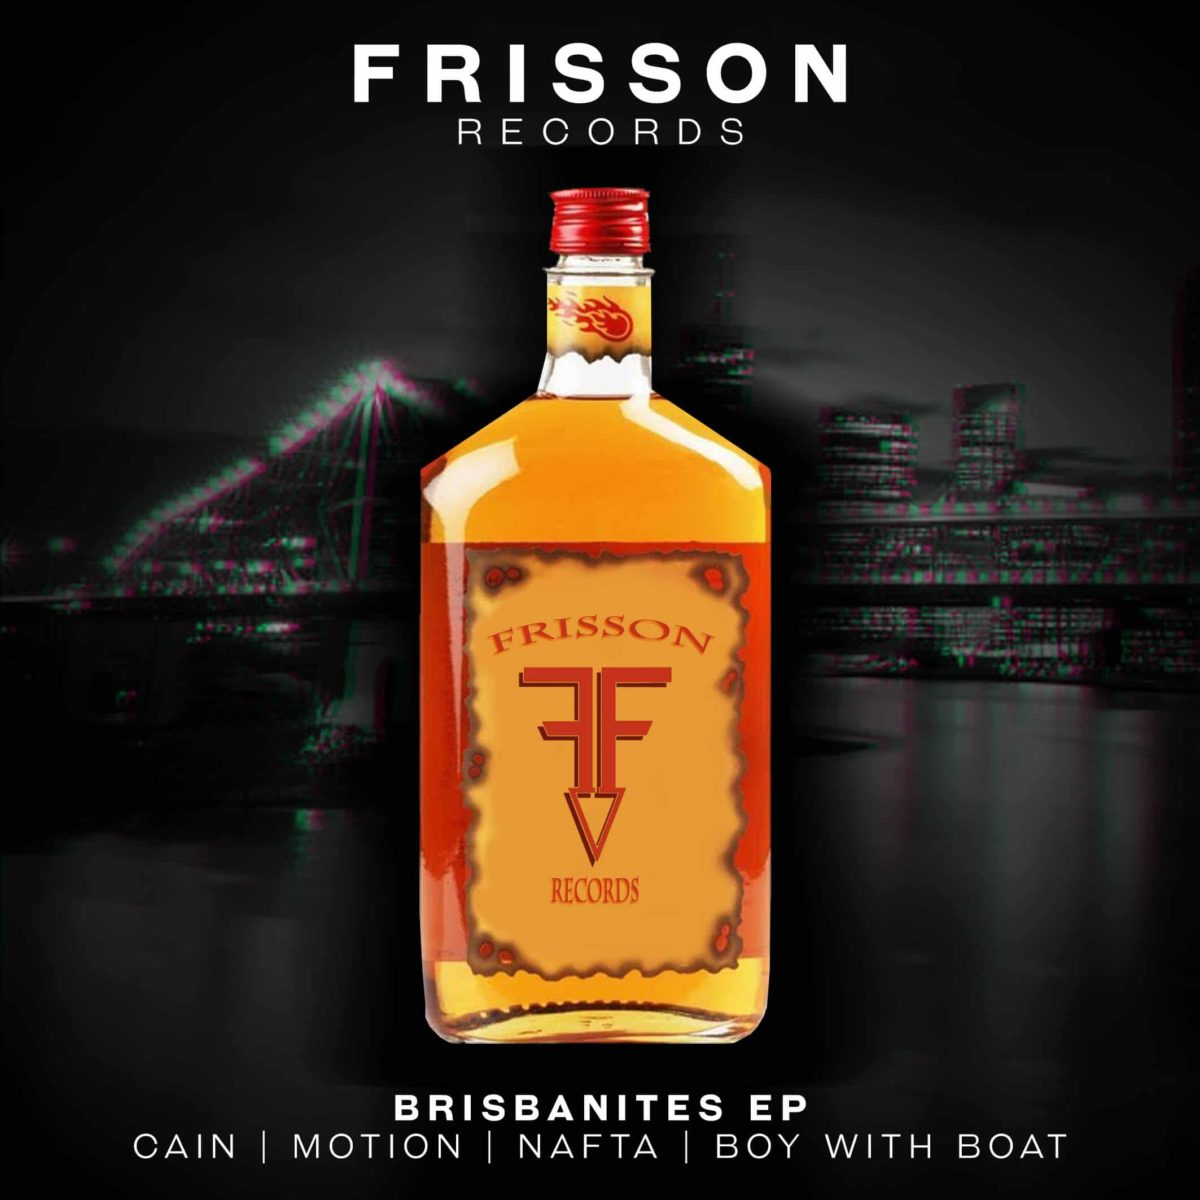 Exclusive Premiere: Frisson Records Present 'Brisbanites' EP